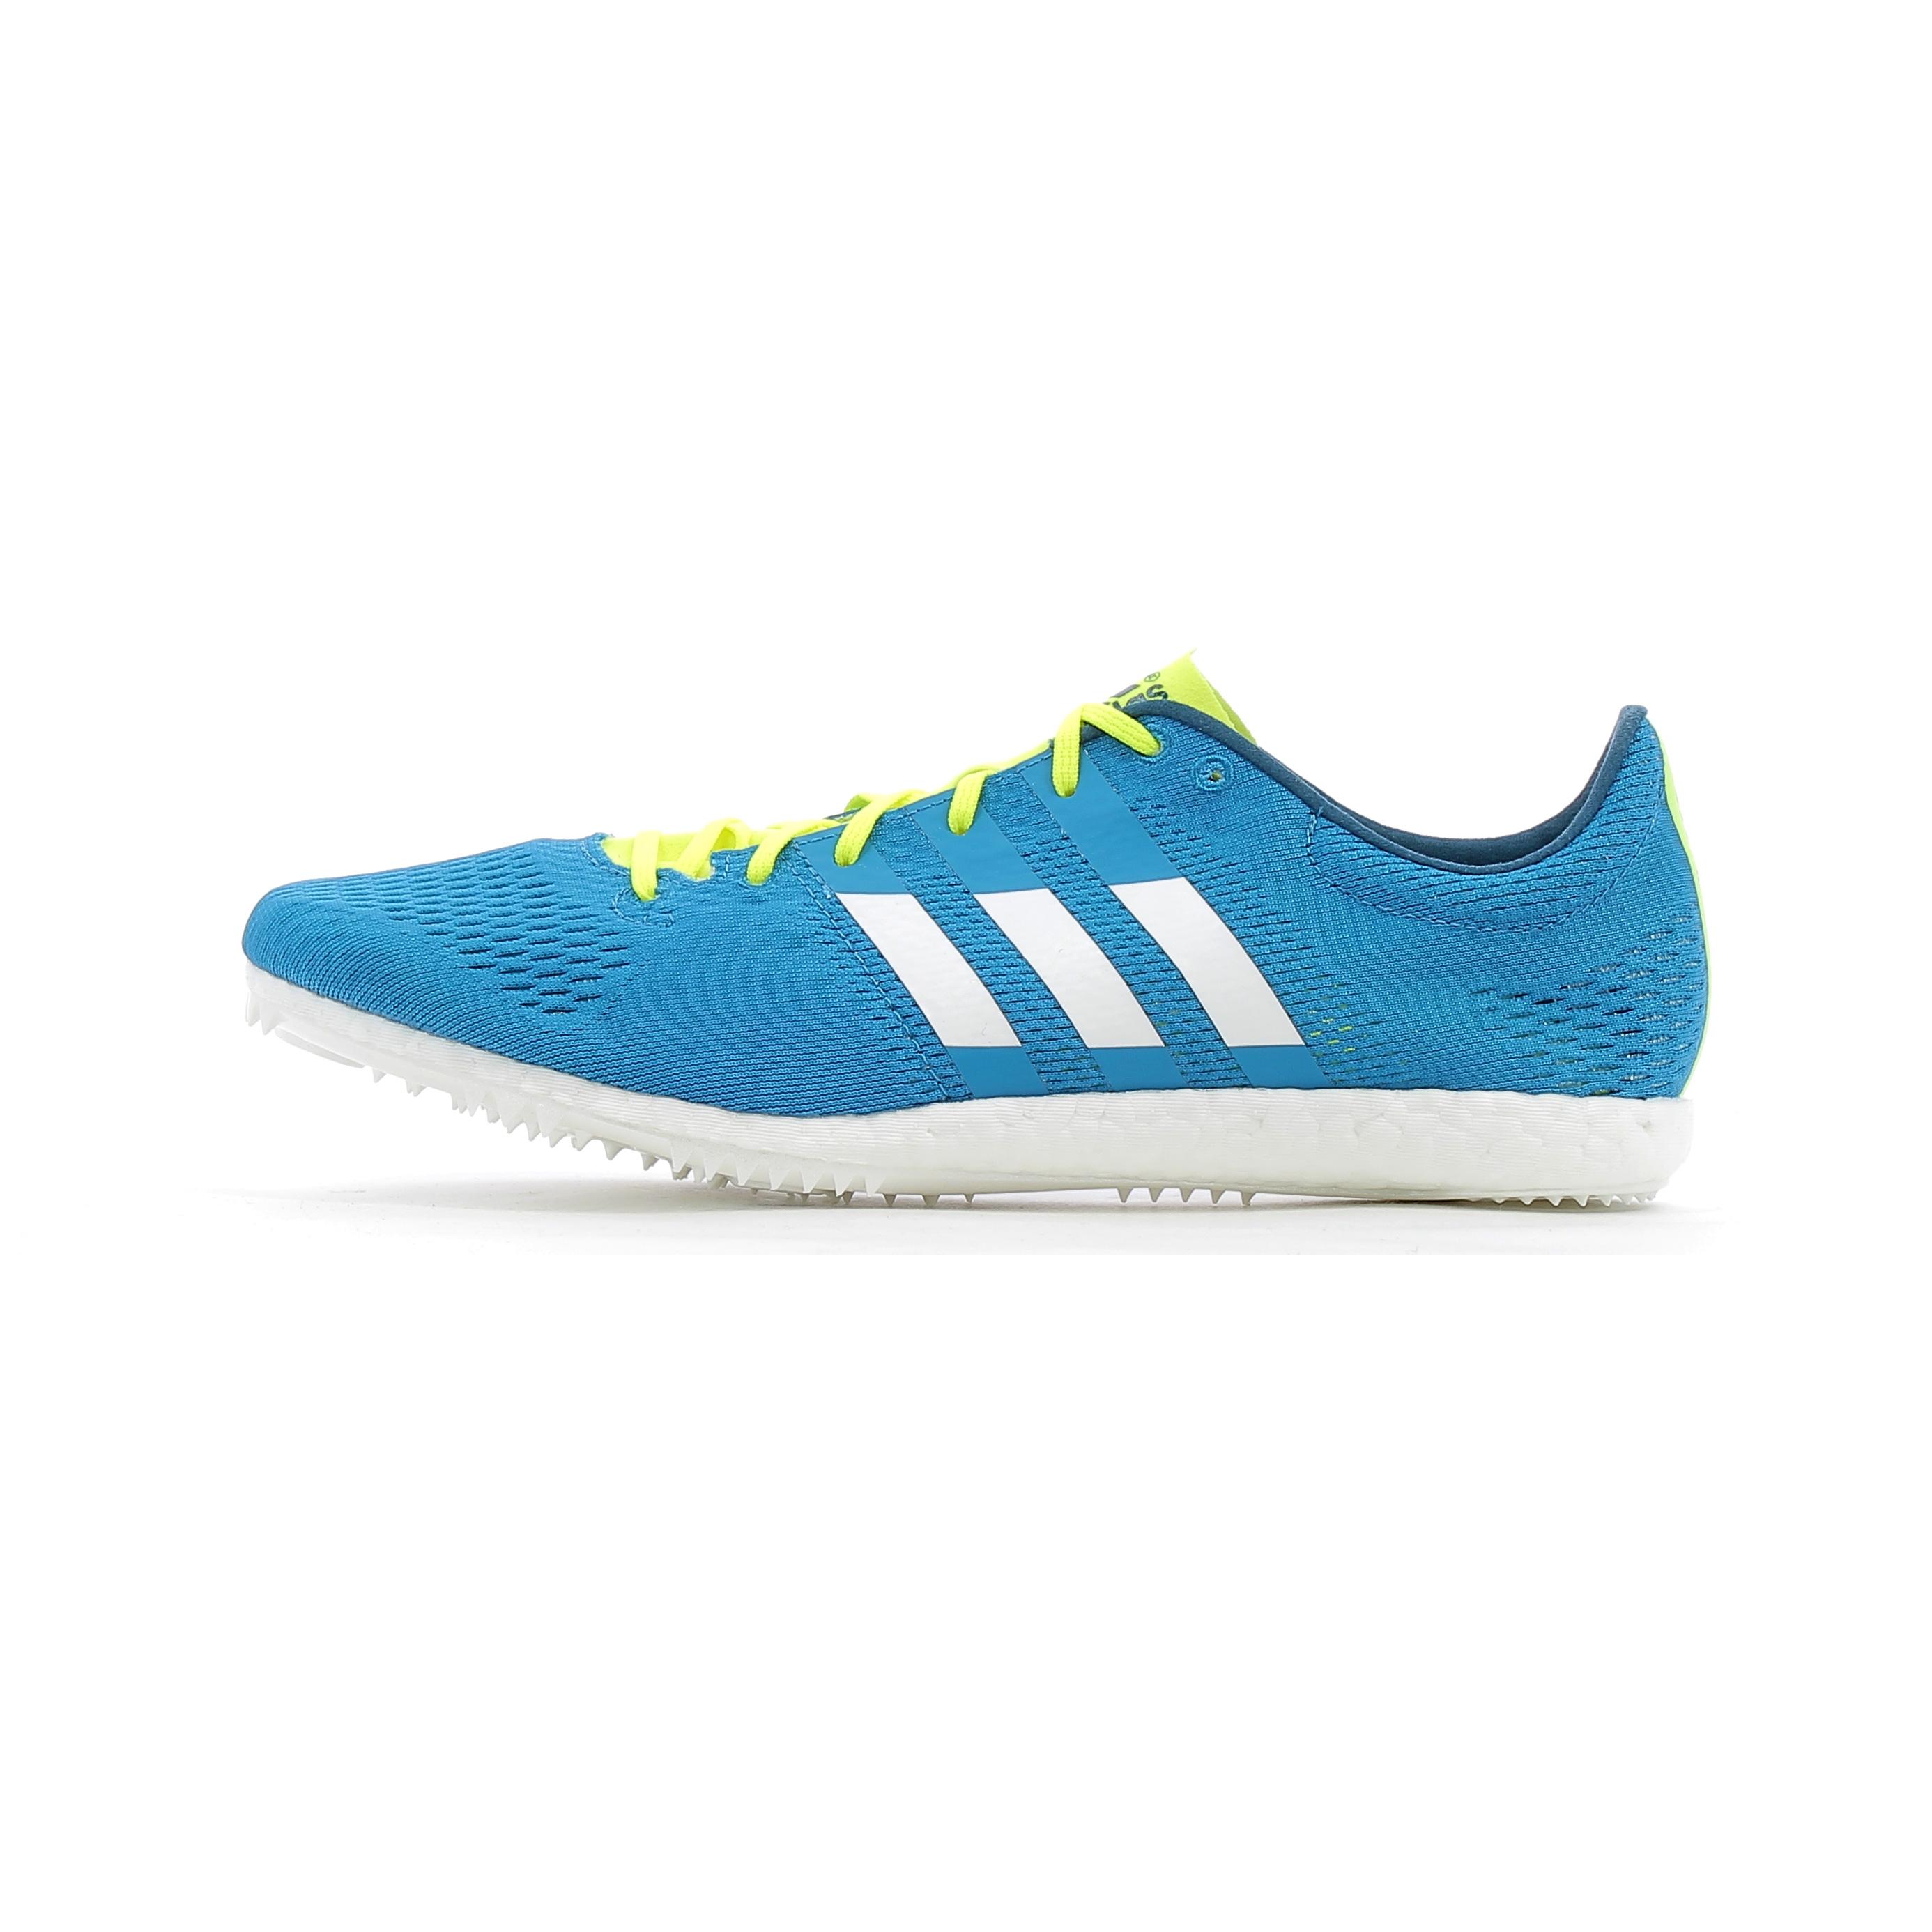 uk availability 101a3 b3a1a Chaussures d Athlétisme adidas running Adizero Avanti Bleu